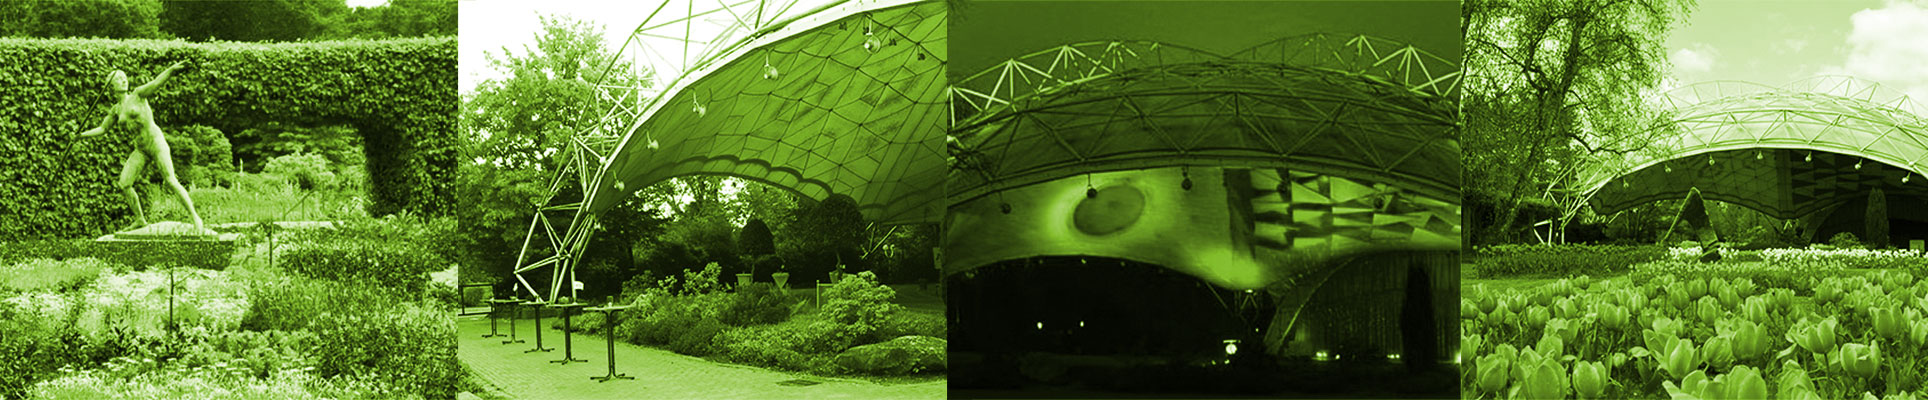 Networking-Essen-garden-party-footer